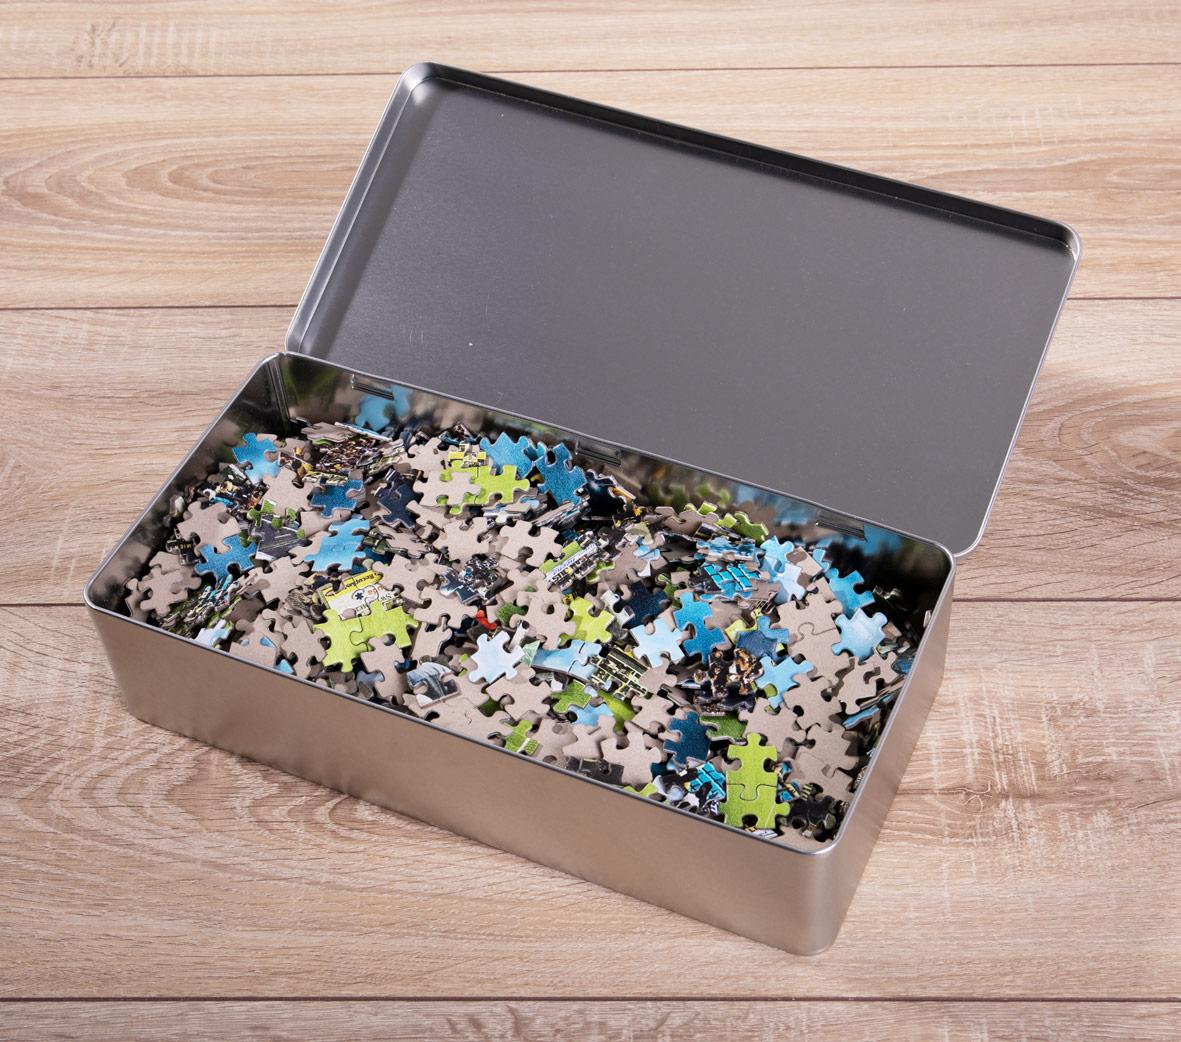 exemplarische Blechbox Puzzle-Verpackung 11FREUNDE SHOP